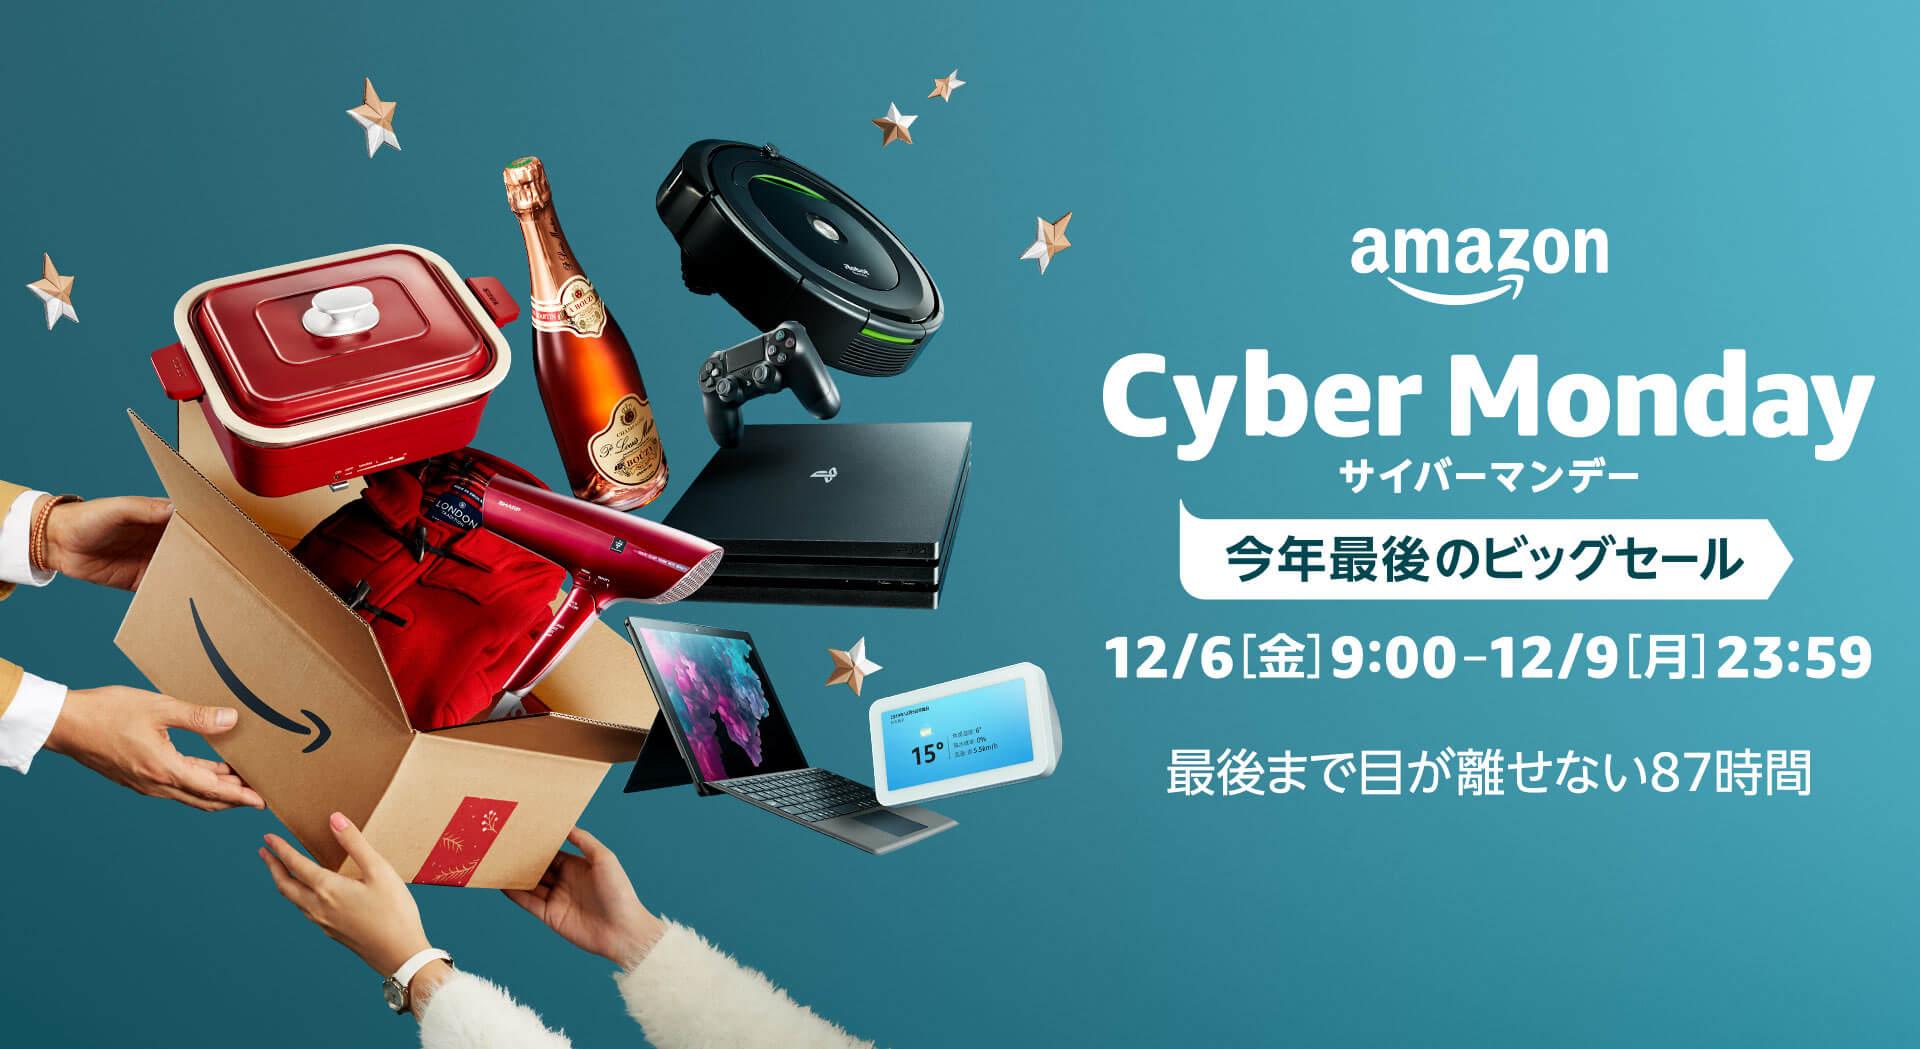 Amazon サイバー マンデー 2020